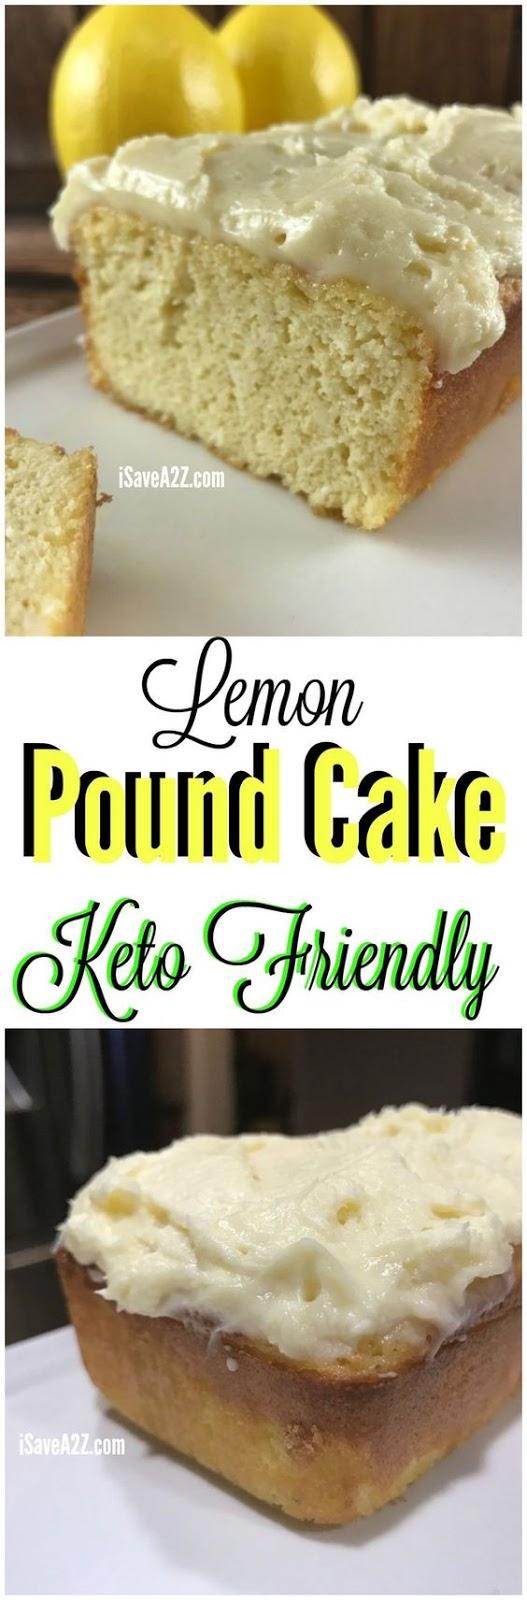 Low Carb Lemon Pound Cake Keto Friendly Recipe #Dessertrecipes#Easydesserts#Cookierecipes#Icecream#Chocolate#Yummyfood#pie#Healthysnacks#Healthymeals#Healthyeating#Healthydessertrecipes#Healthyfoodrecipes#Nicecream #Dessertrecipes#Easydesserts#Cheesecakerecipes#Deliciousdesserts#Dessertvideos#Healthydessertrecipes#Healthyfood#Vegandessert#Healthycookies#Healthysweetsnacks#Paleodessert#Cakerecipes#Coffee#Healthydesserts#Dessertrecipeseasy#Chocolatemousserecipe#Chocolatecheesecake#Nobakecookies#Chocolatedesserts#Oreodessert#Easynobakedesserts#Peanutbutterdesserts#Nobakecheesecakerecipes#Chocolatepuddingdessert#Creamcheesedesserts#Yummydesserts#Chocolatepeanutbutterdesserts#Gooddesserts#Lushdessertrecipes #LowCarbLemonPoundCakeKetoFriendlyRecipe